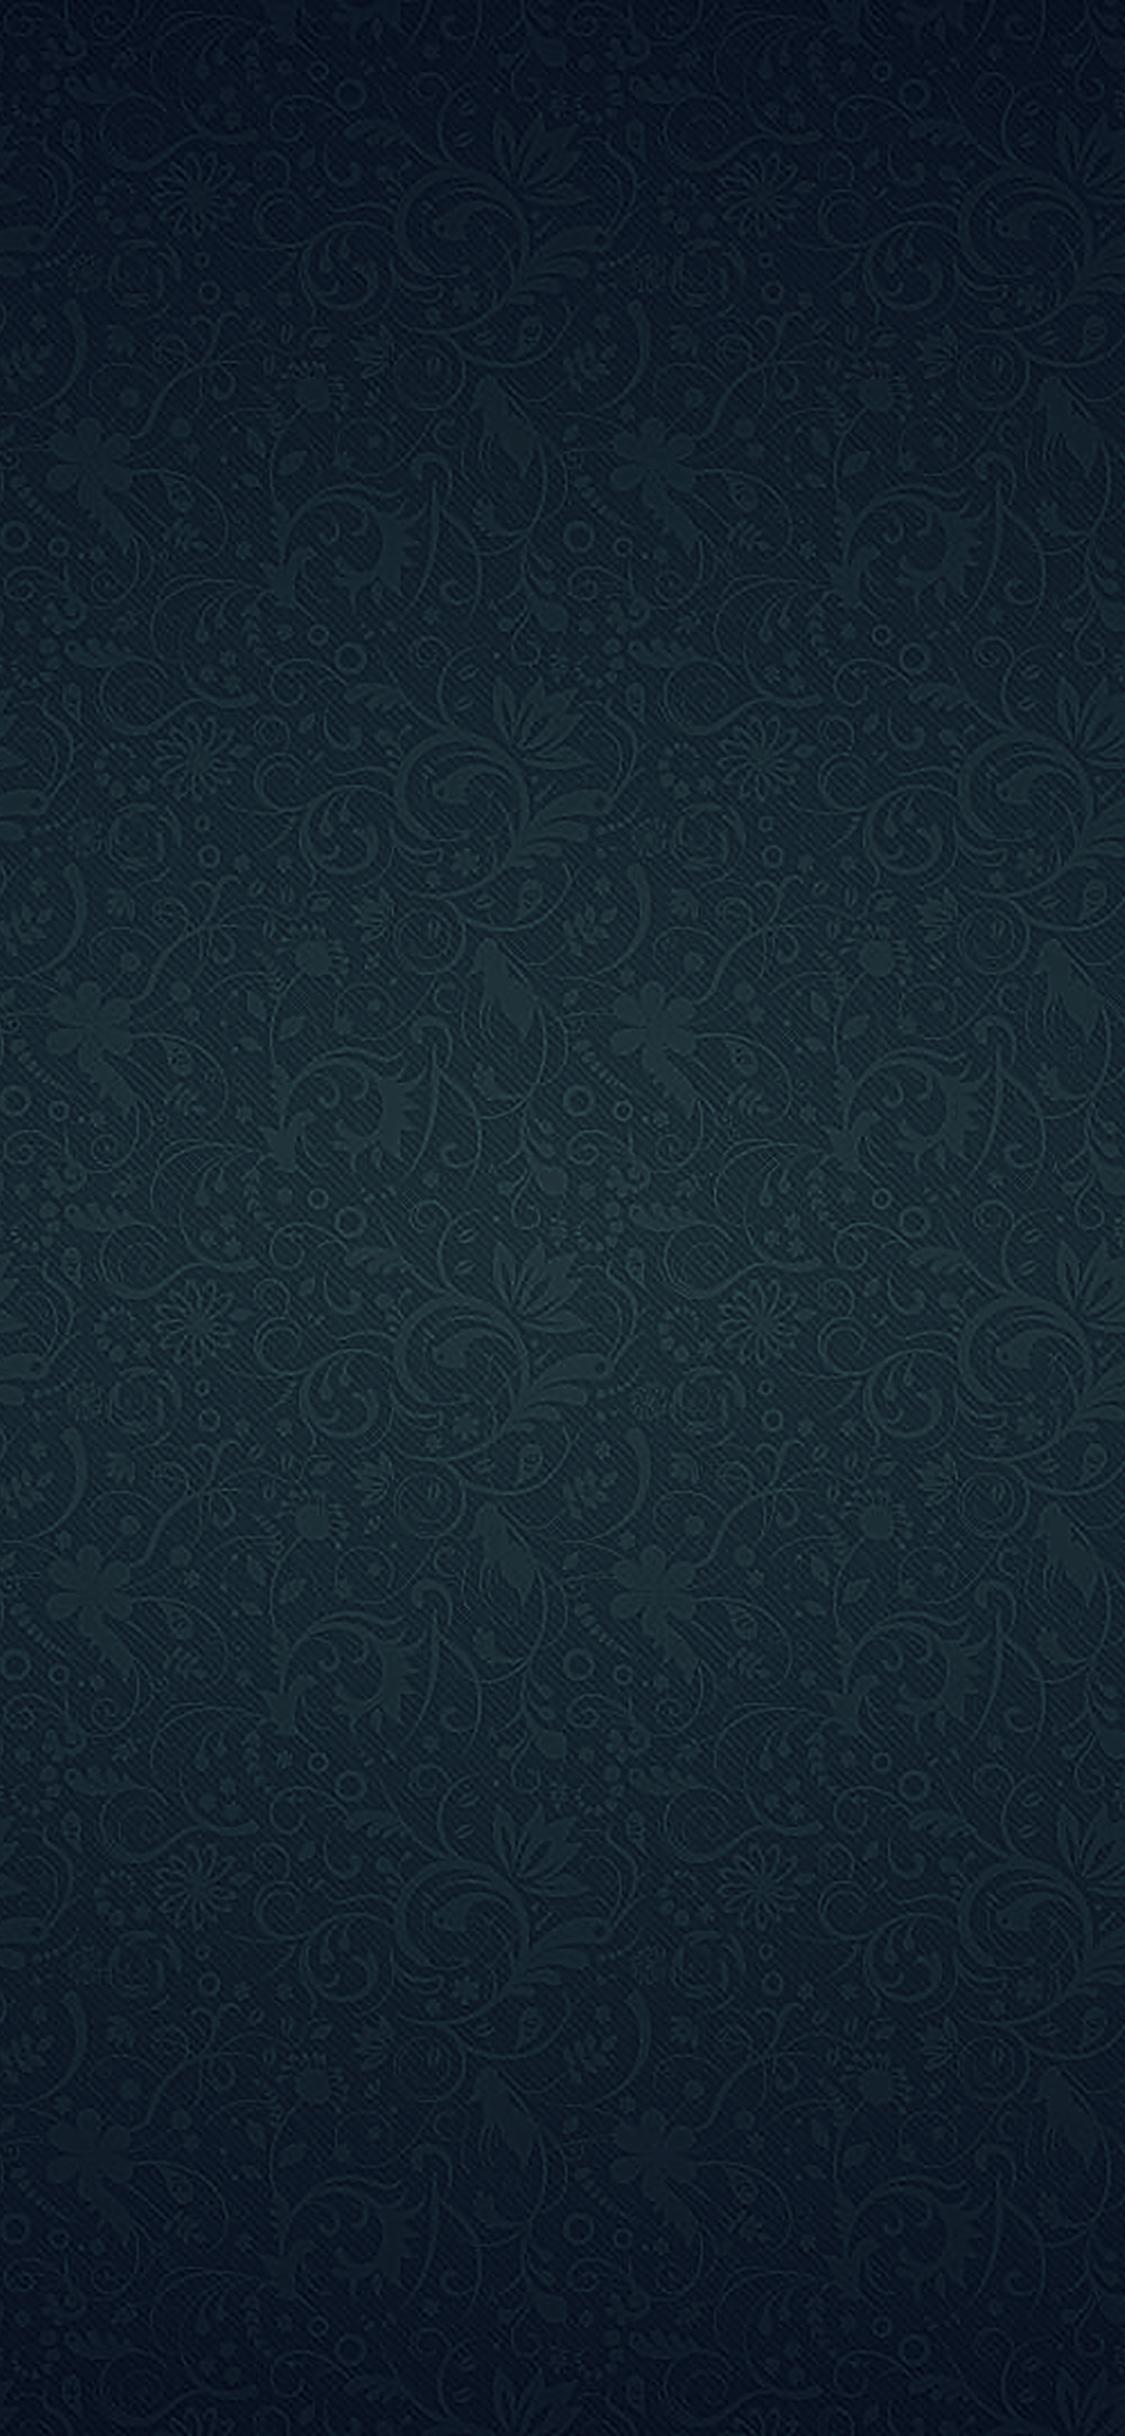 iPhoneXpapers.com-Apple-iPhone-wallpaper-vf79-blue-ornament-texture-pattern